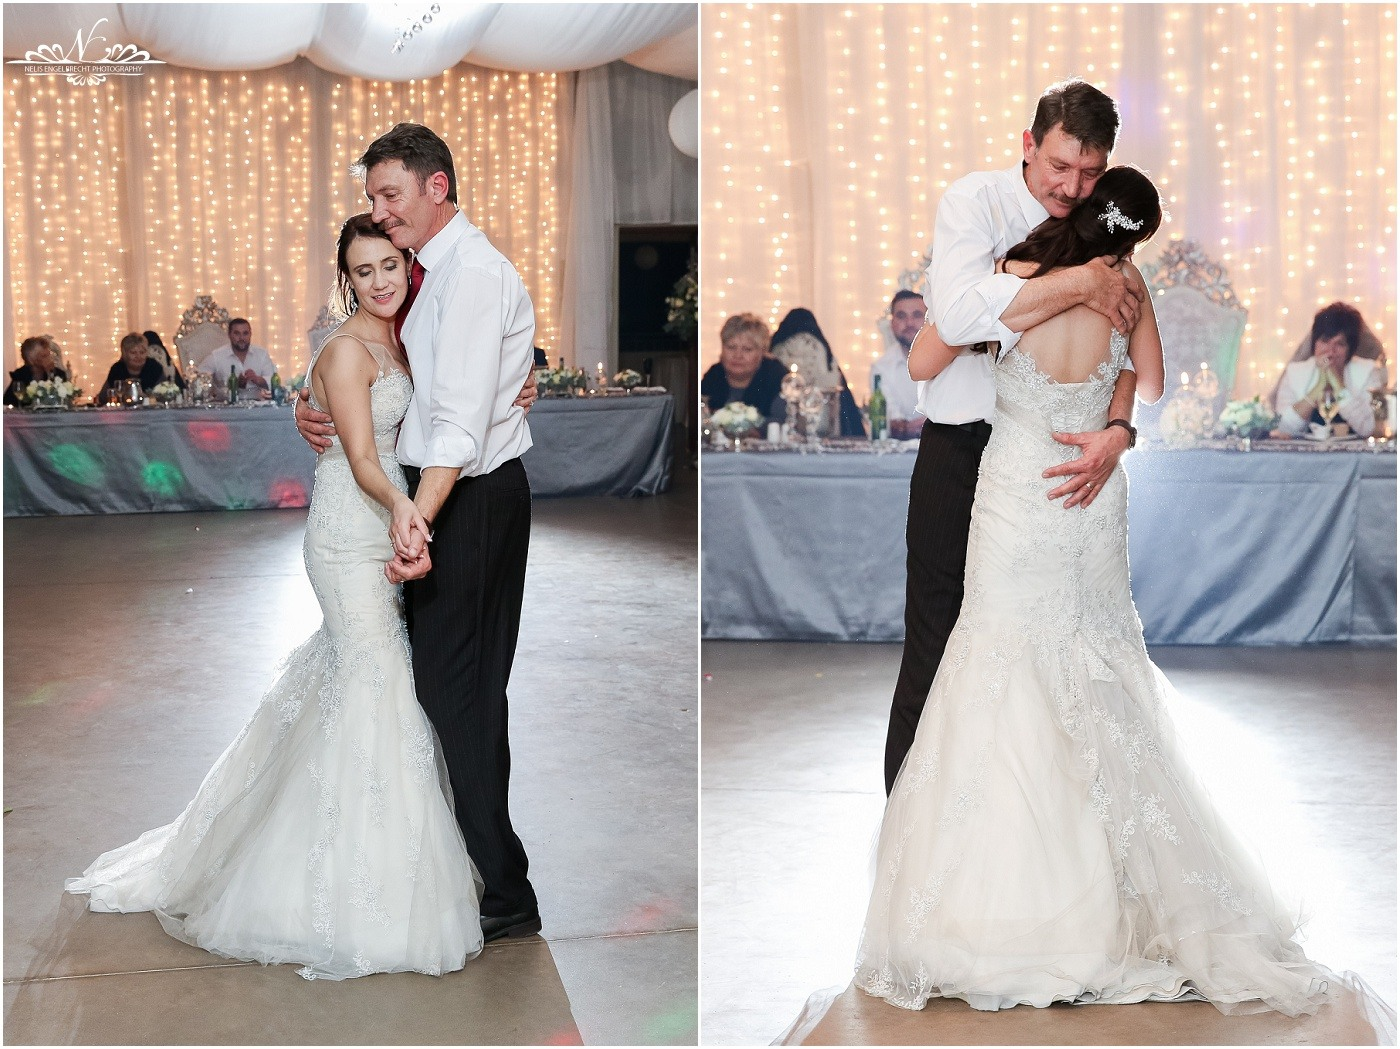 Eensgezind-Wedding-Photos-Nelis-Engelbrecht-Photography-217